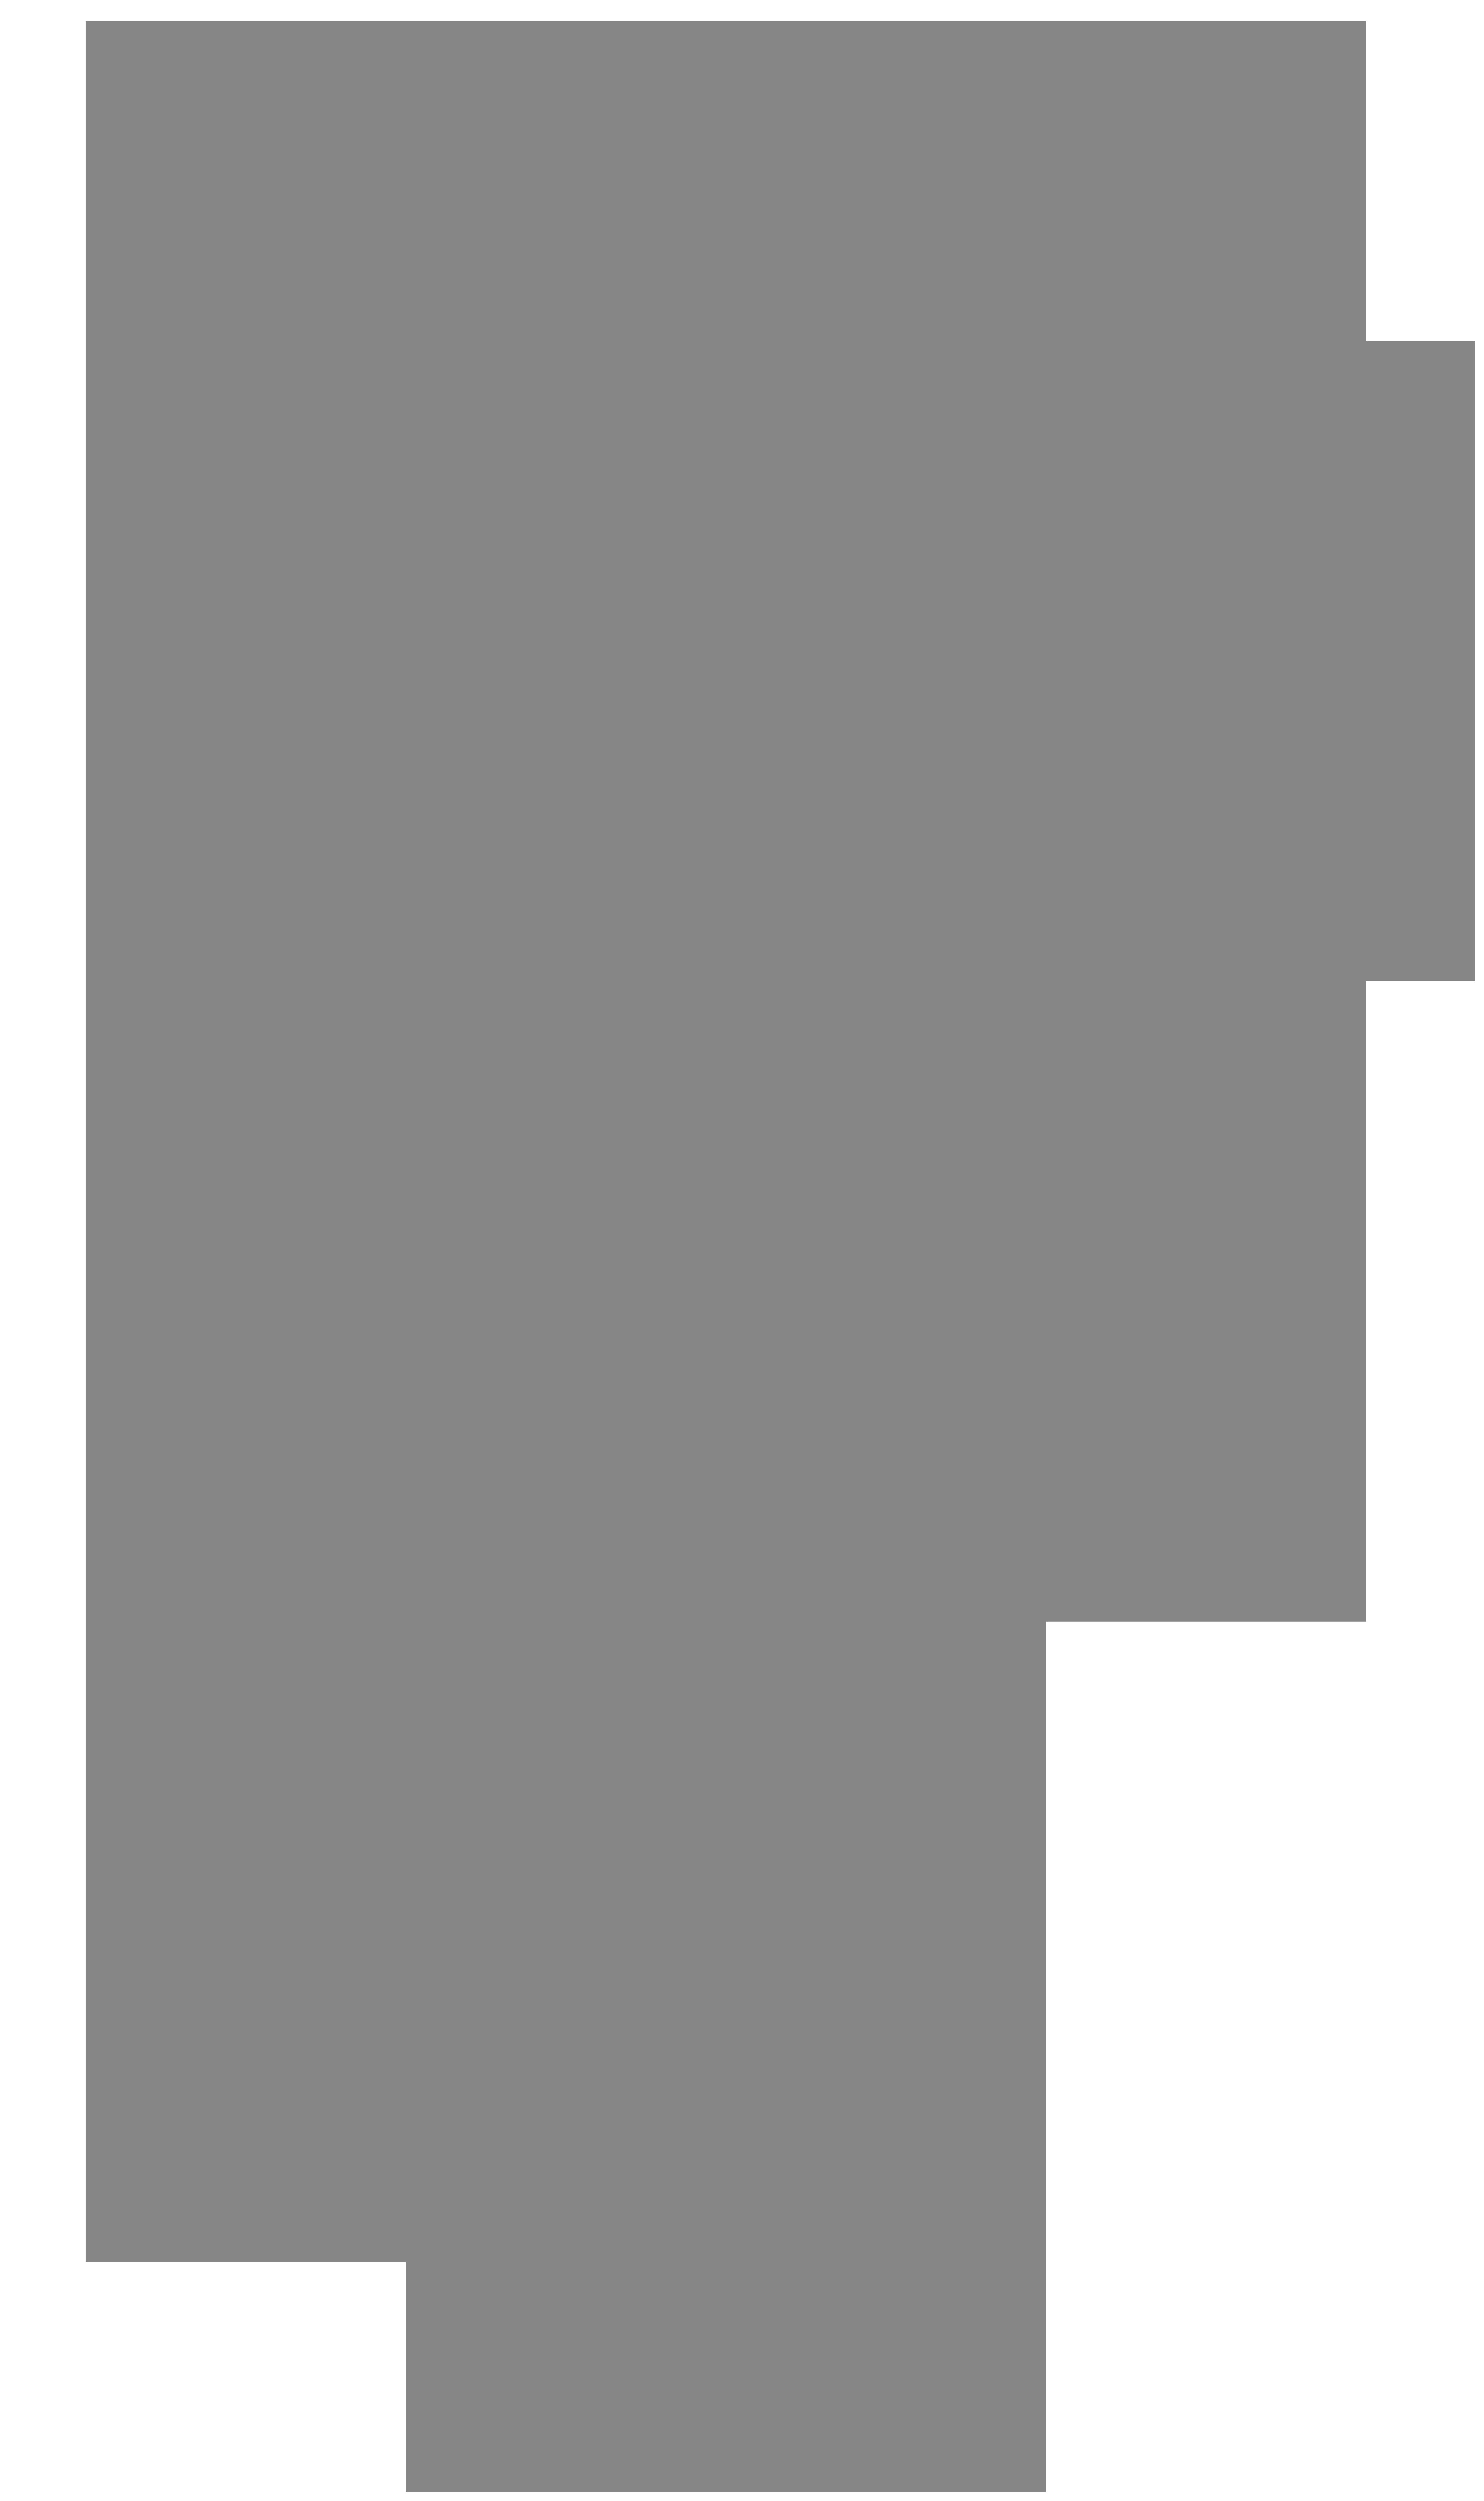 Smoke Clip Art Transparent Image.